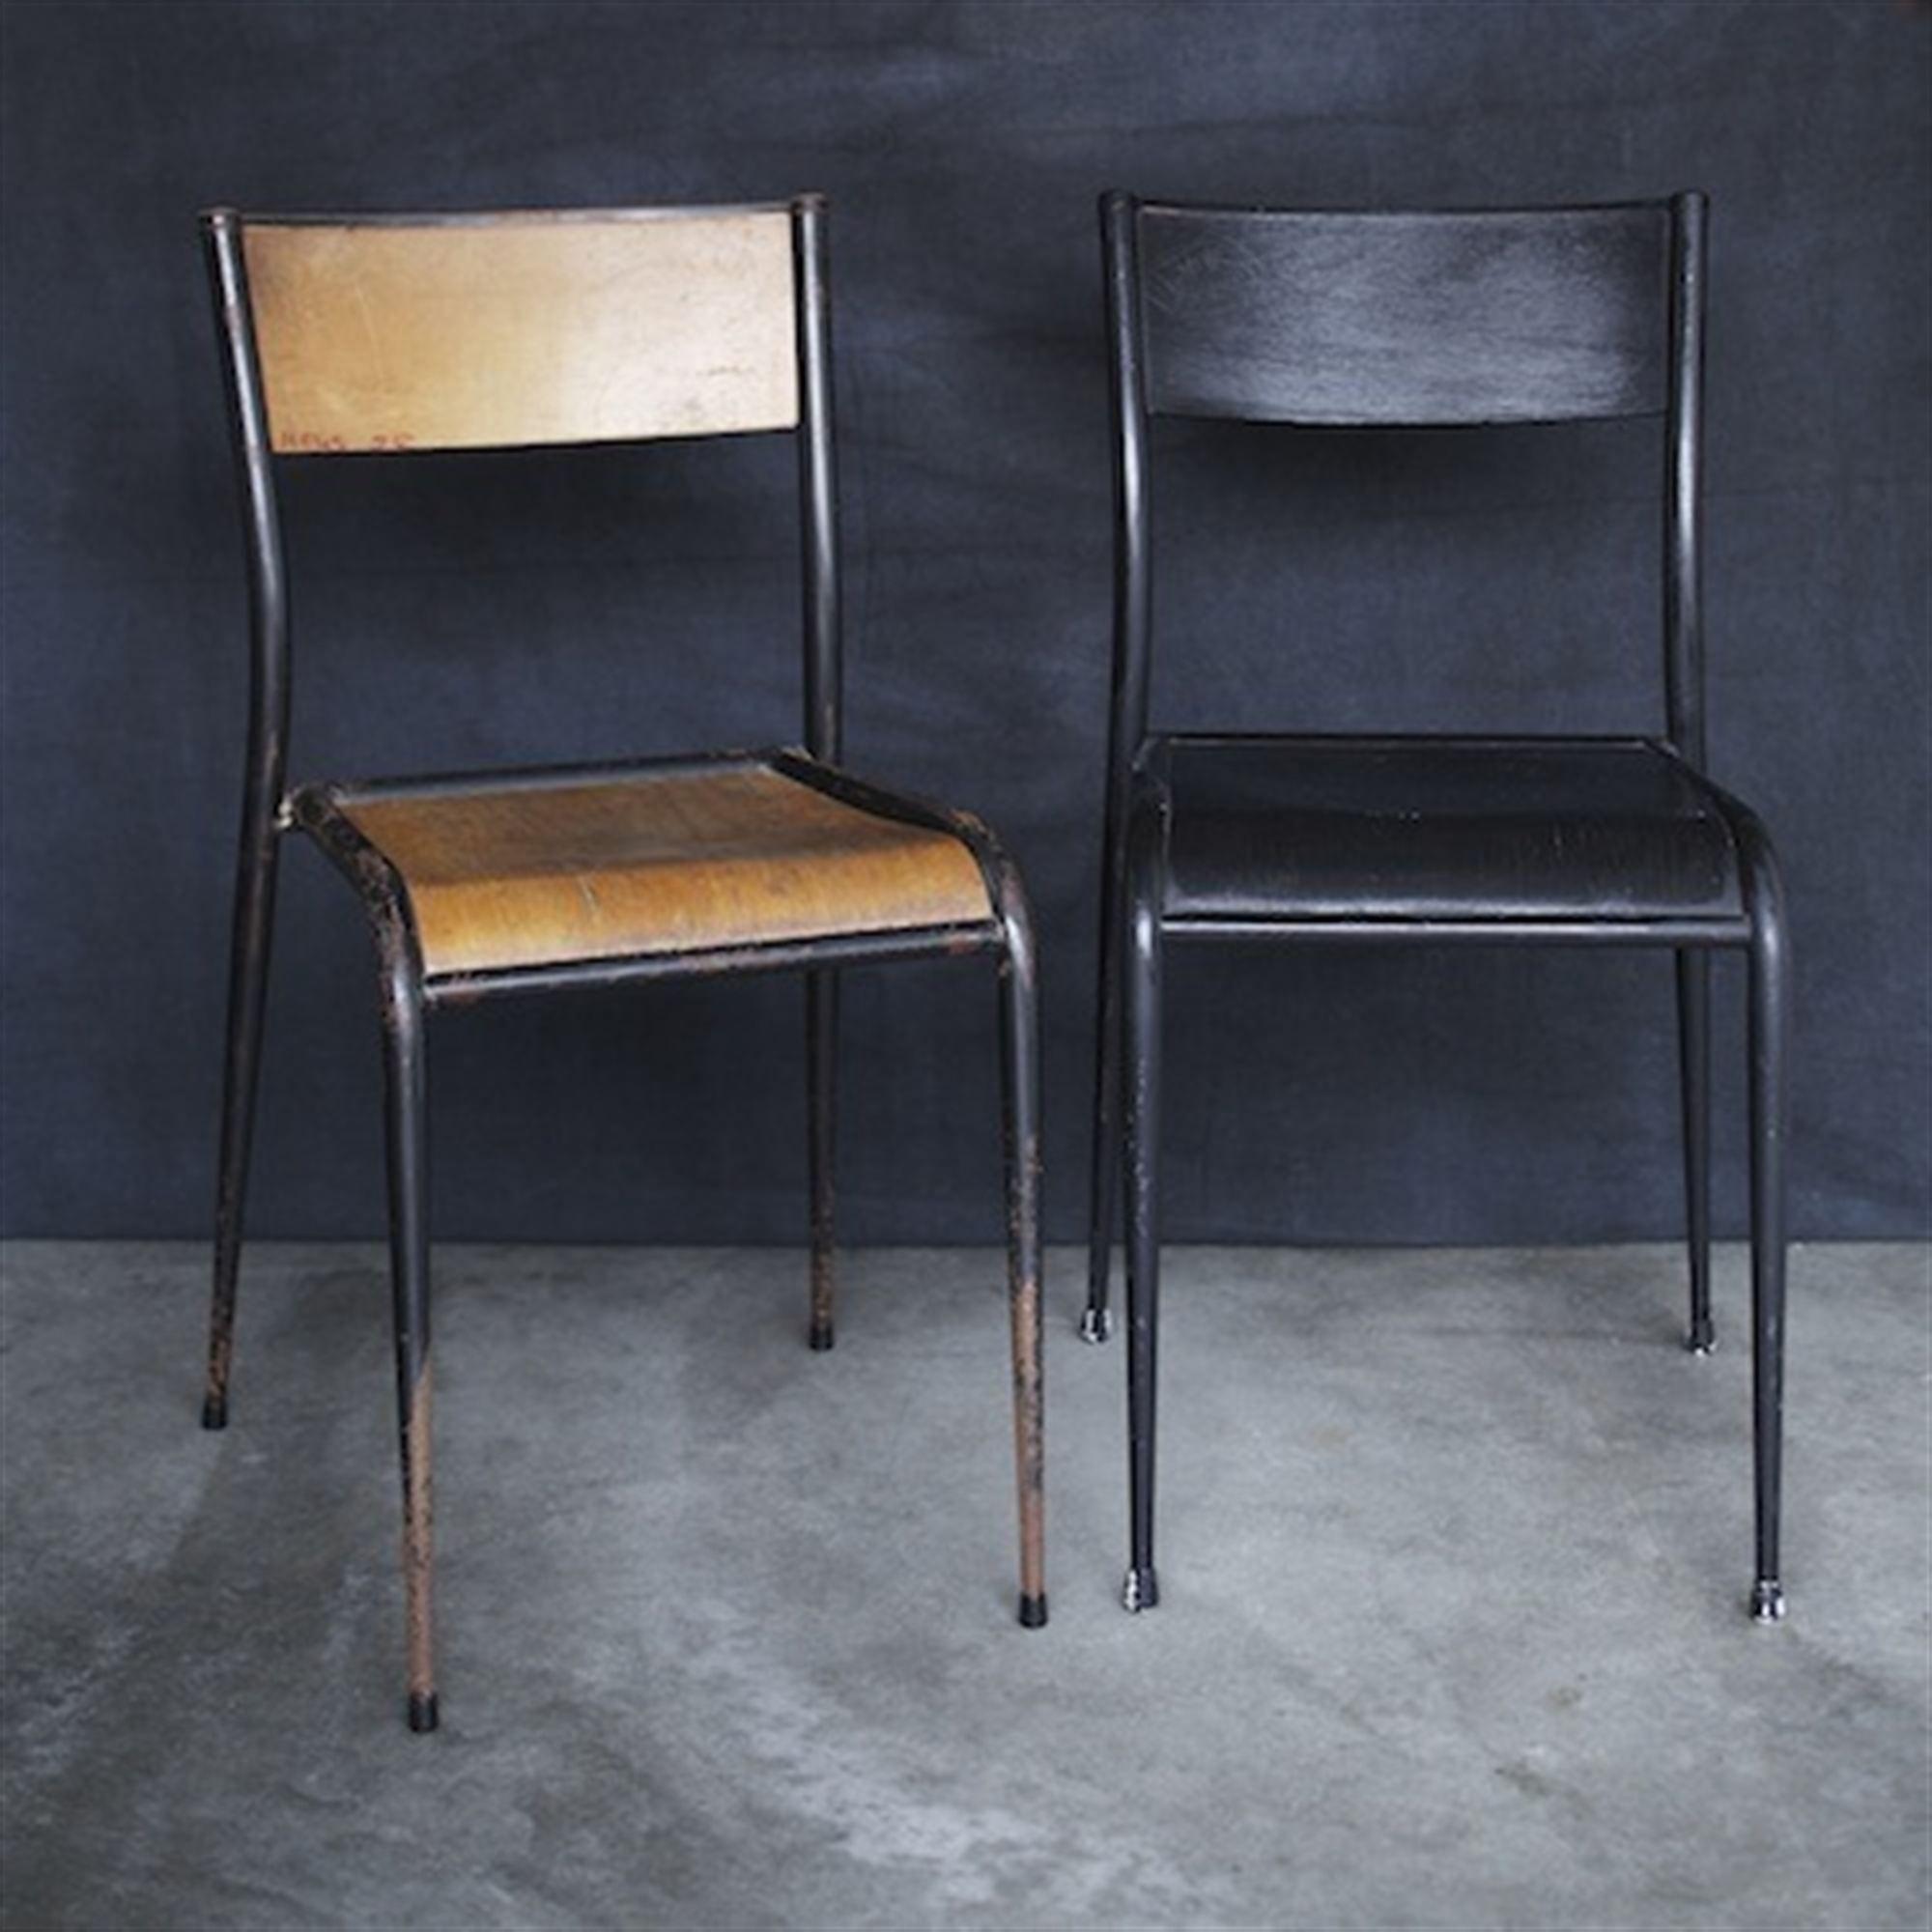 perfect greenhouse design studio vintage schoolhouse chair